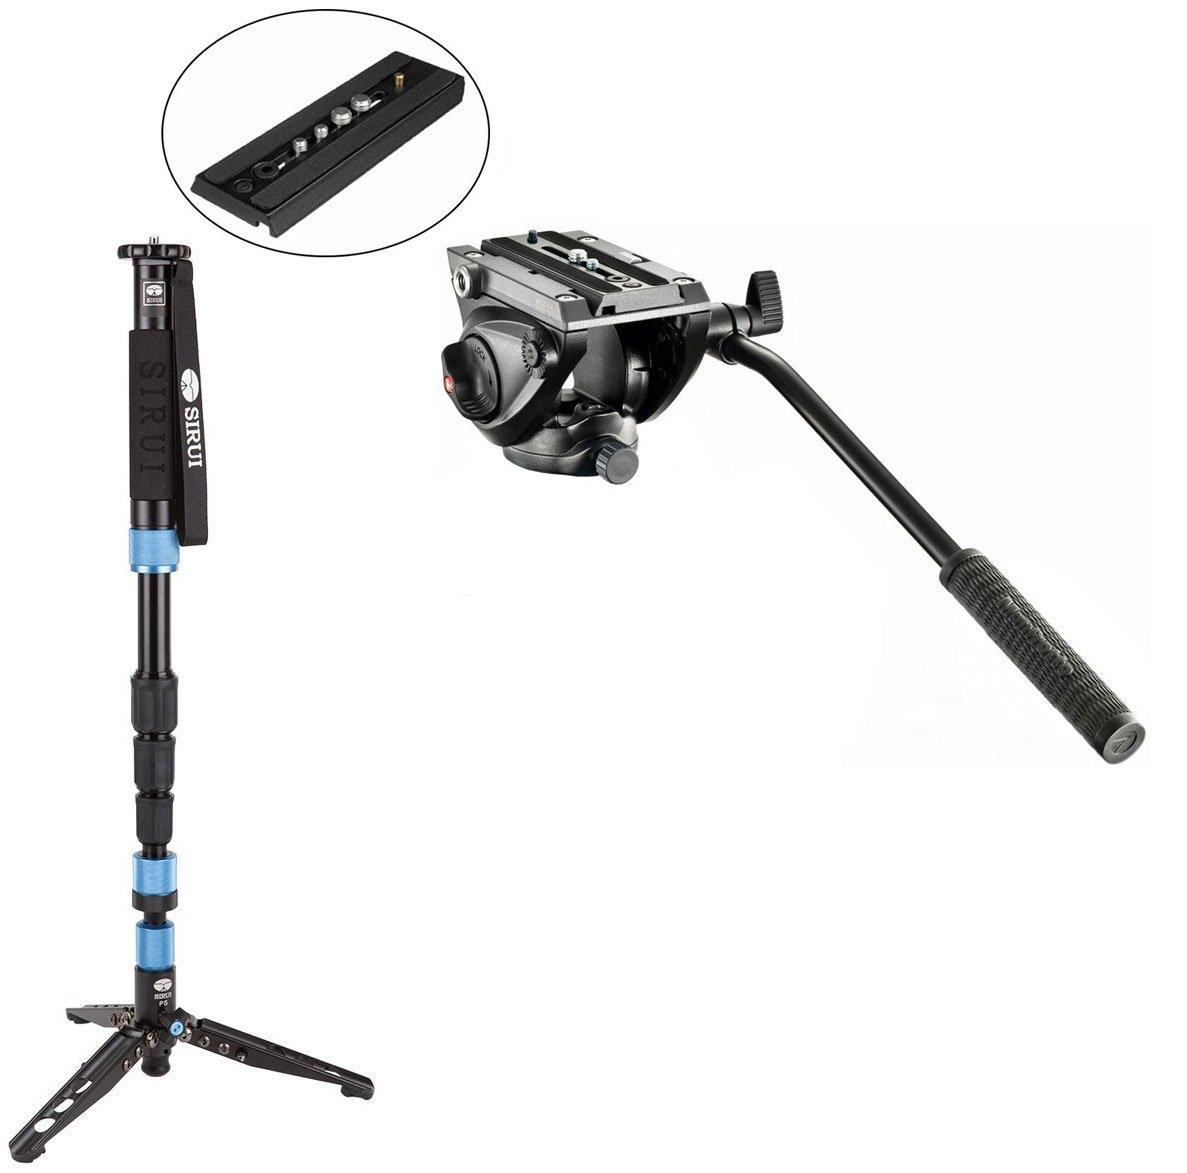 Calumet Sirui SUP204SR Photo/Video Monopod w/ MVH500AH Pro Fluid Video Tripod Head with Flat Base and a Bonus Sliding Plate w/ 1/4''-20 & 3/8'' Fixing Screws